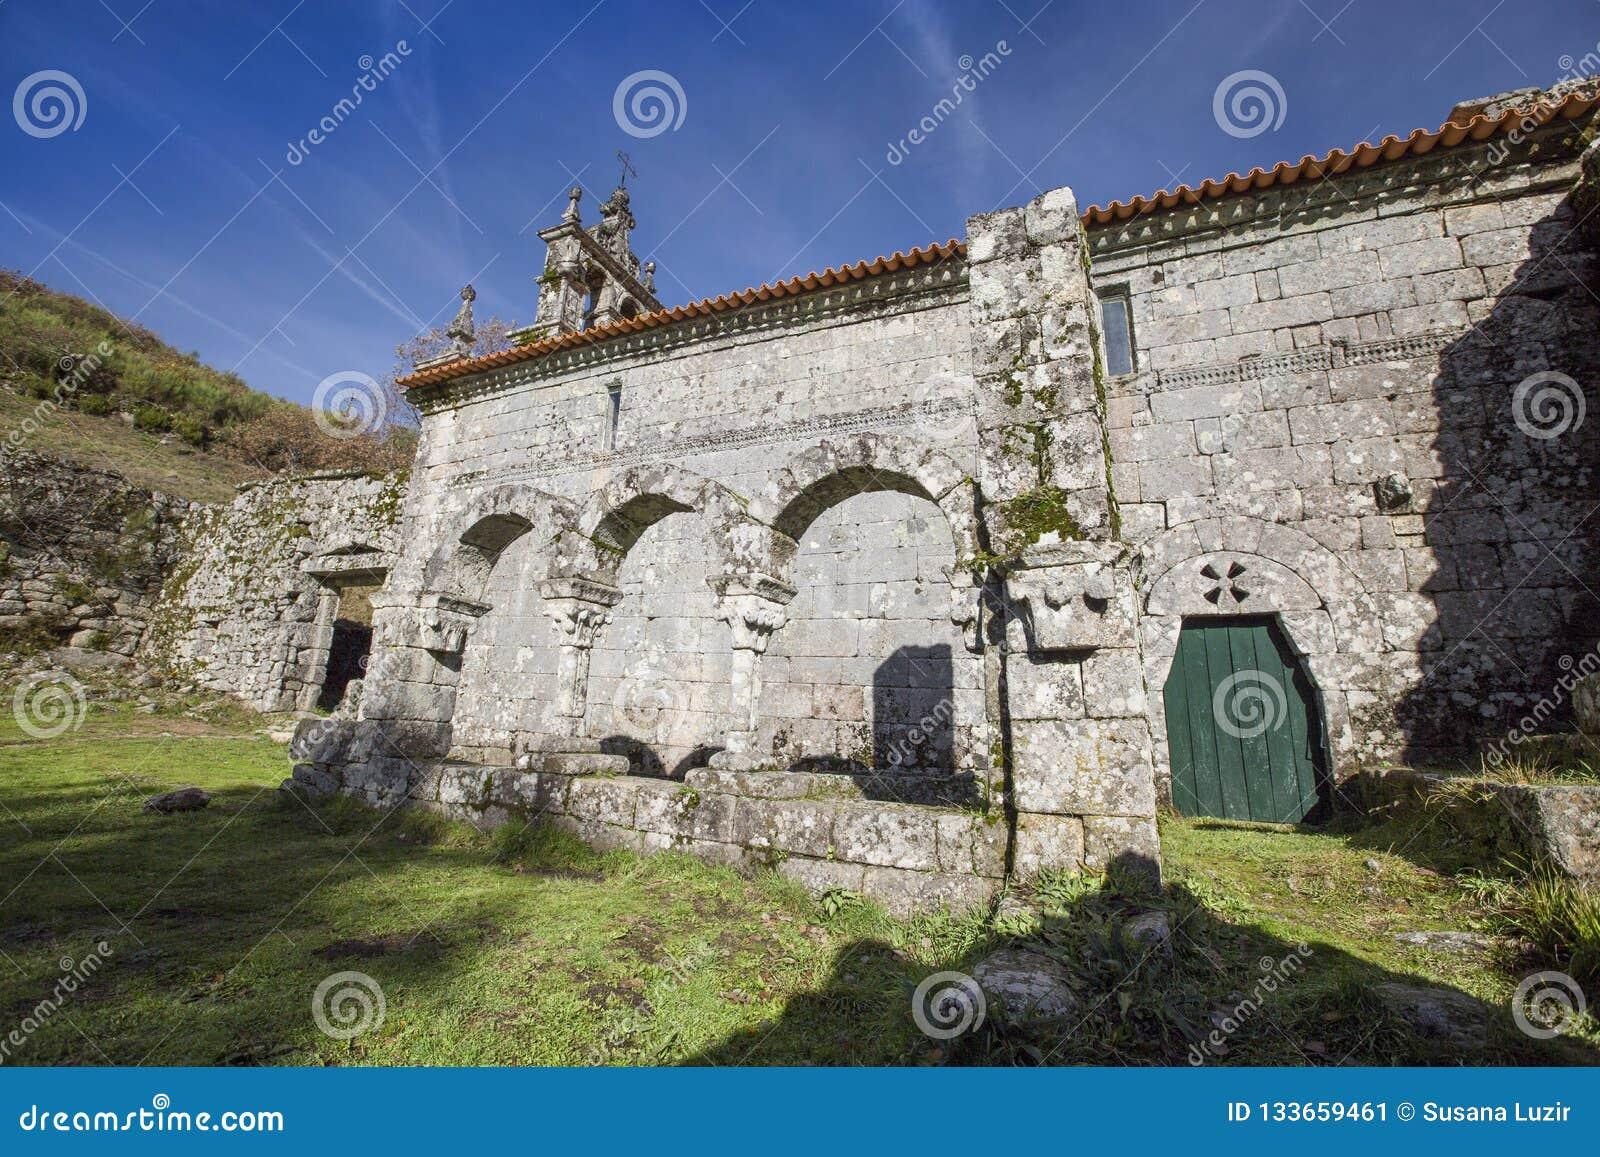 PORTUGAL - PITOES DAS JUNIAS MONASTERY, GERES - 5 DECEMBER